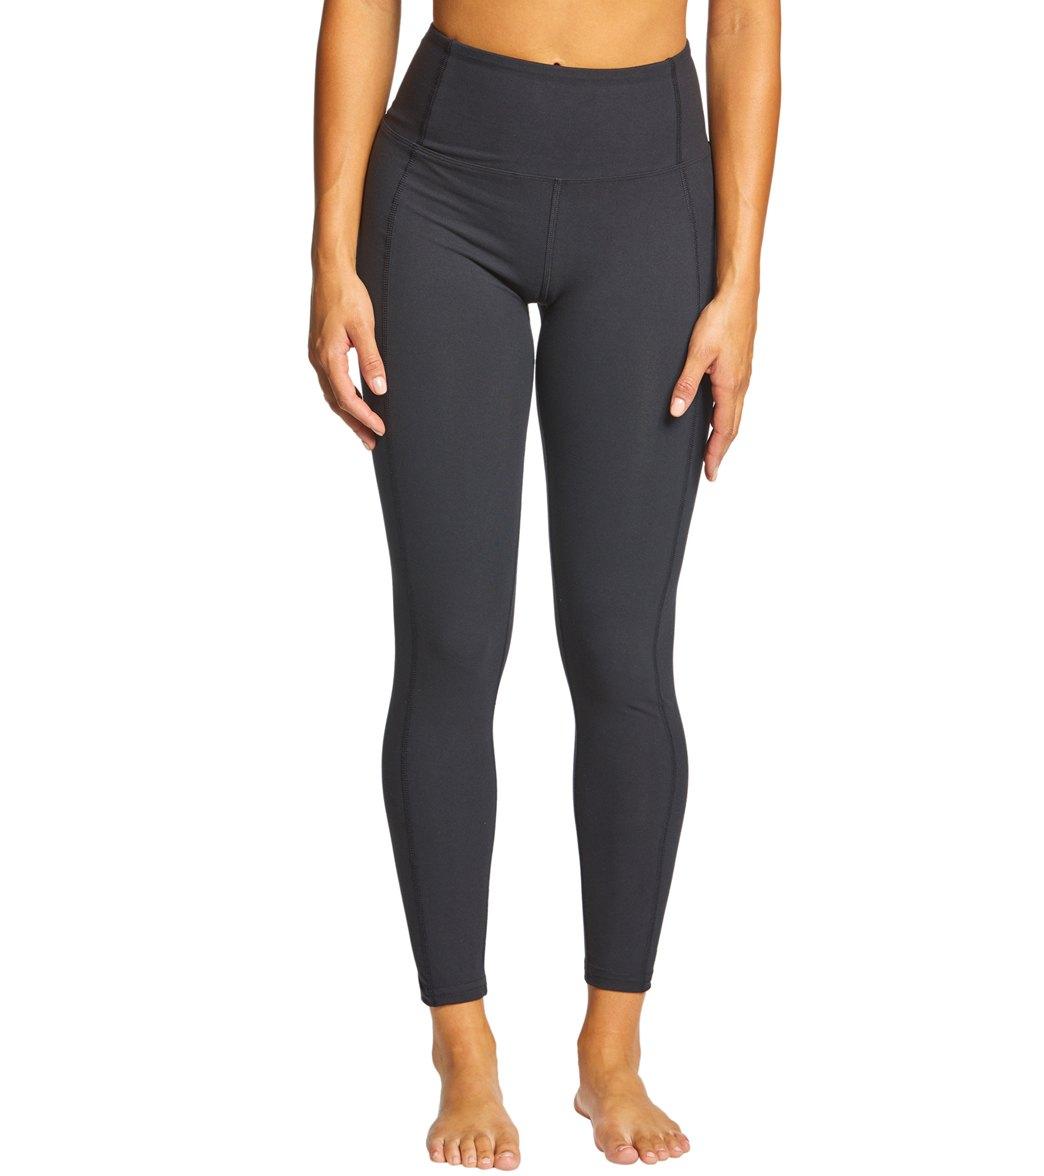 769e0cc110d70 Marika High Rise Tummy Control Yoga Leggings at YogaOutlet.com ...